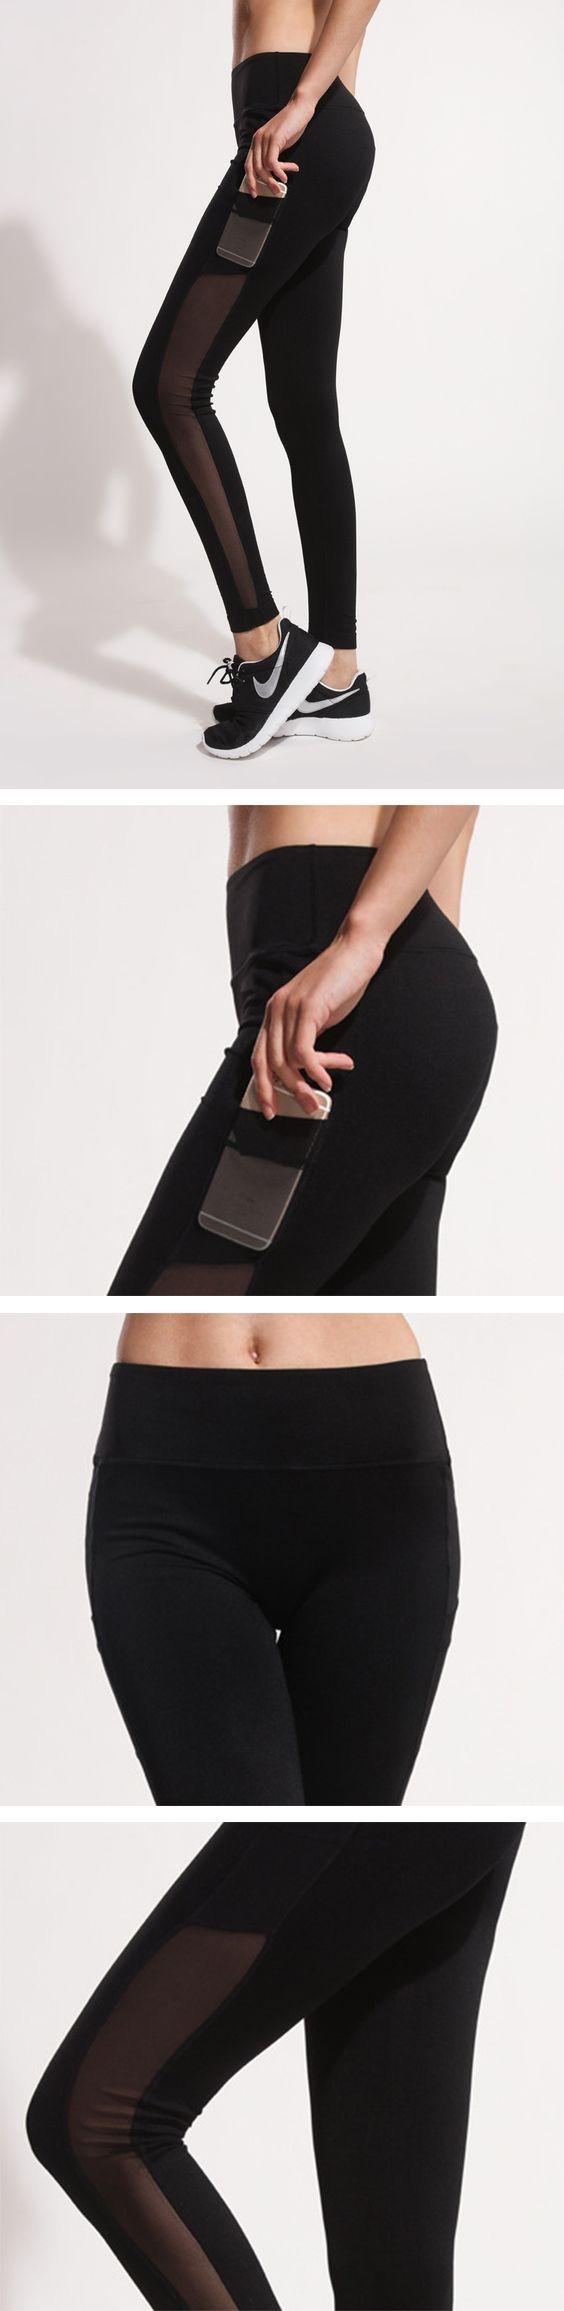 Women's Side Pockets Mesh Skinny Running Yoga Pants